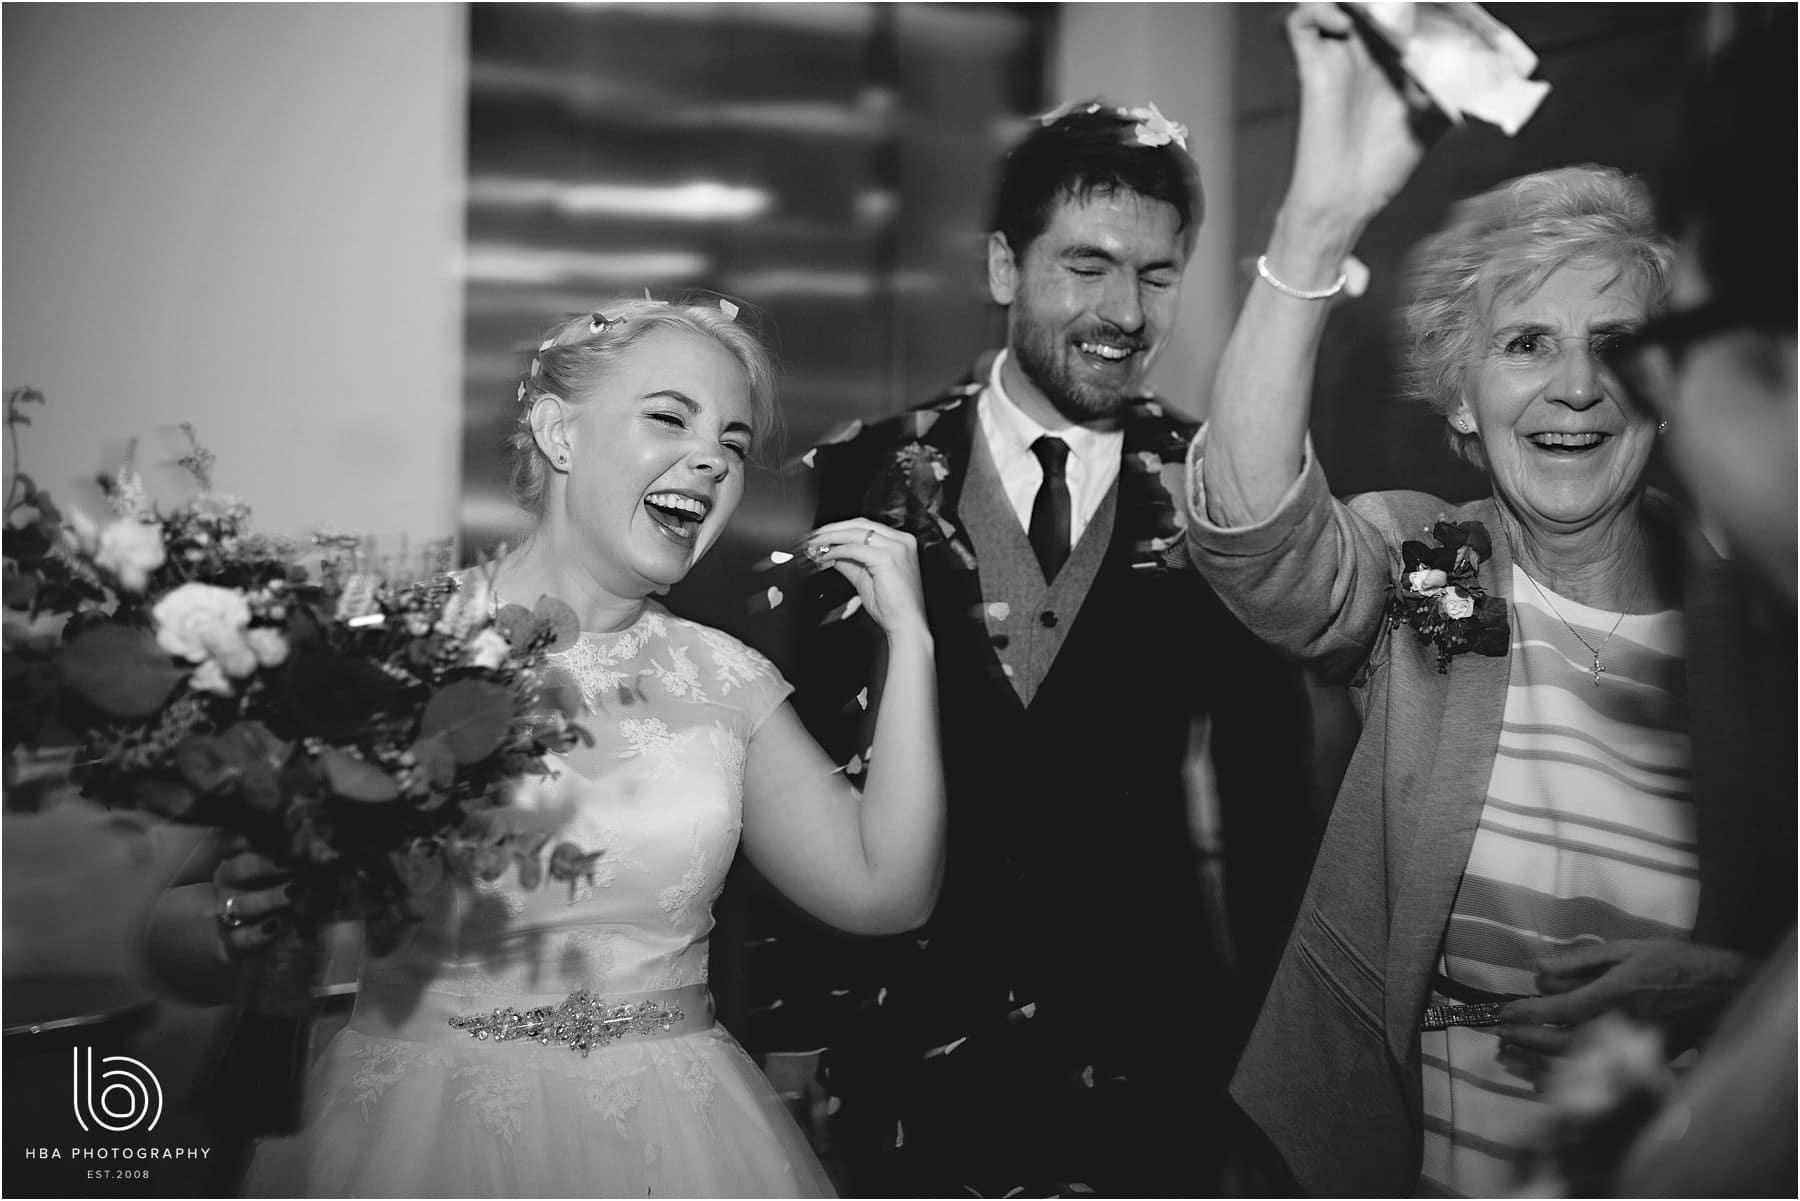 Grandma throwing confetti in black-and-white